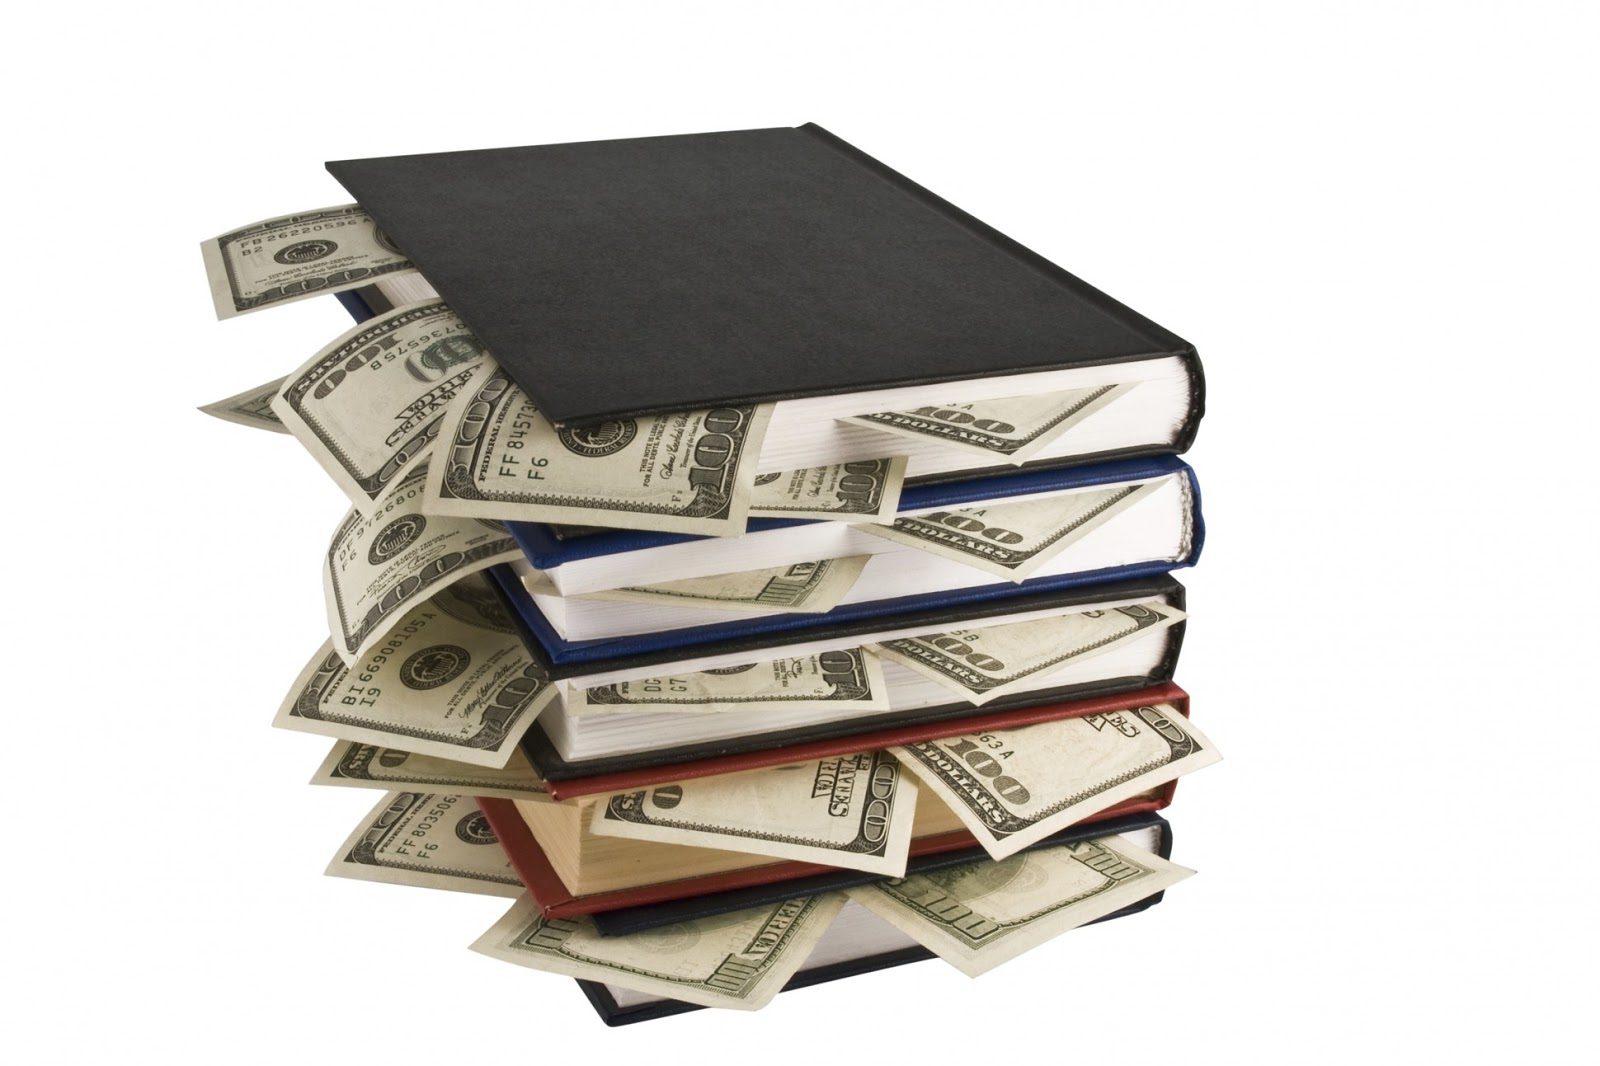 1521c1824 فائدة : أكثر من 140 طريقة و كيفية لتربح و تحصل 1000 دولار شهريا اوأكثر